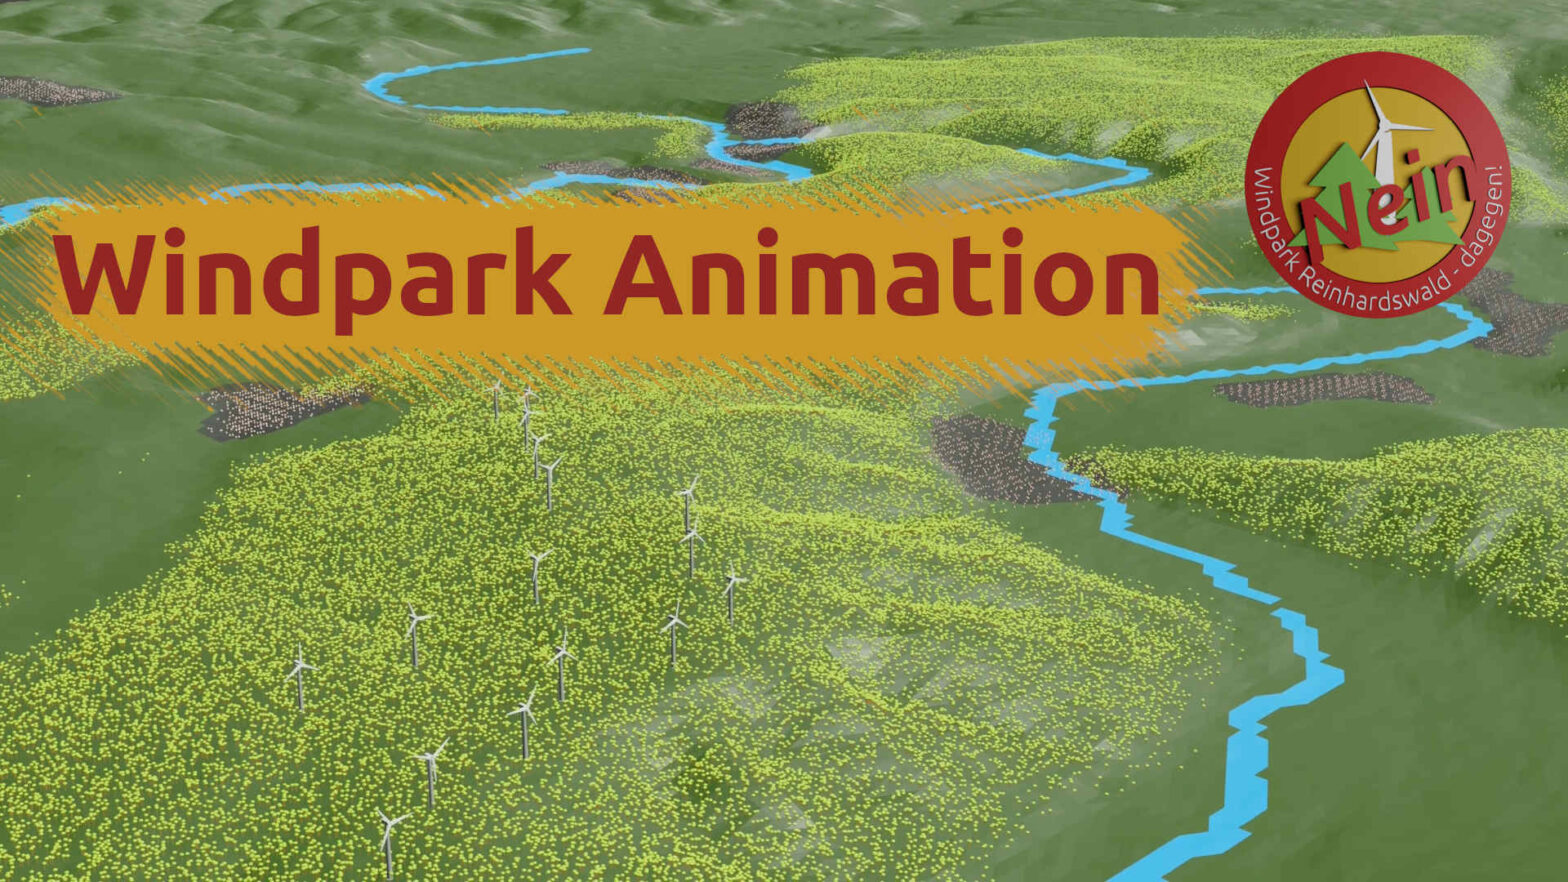 Animation Windpark Reinhardswald